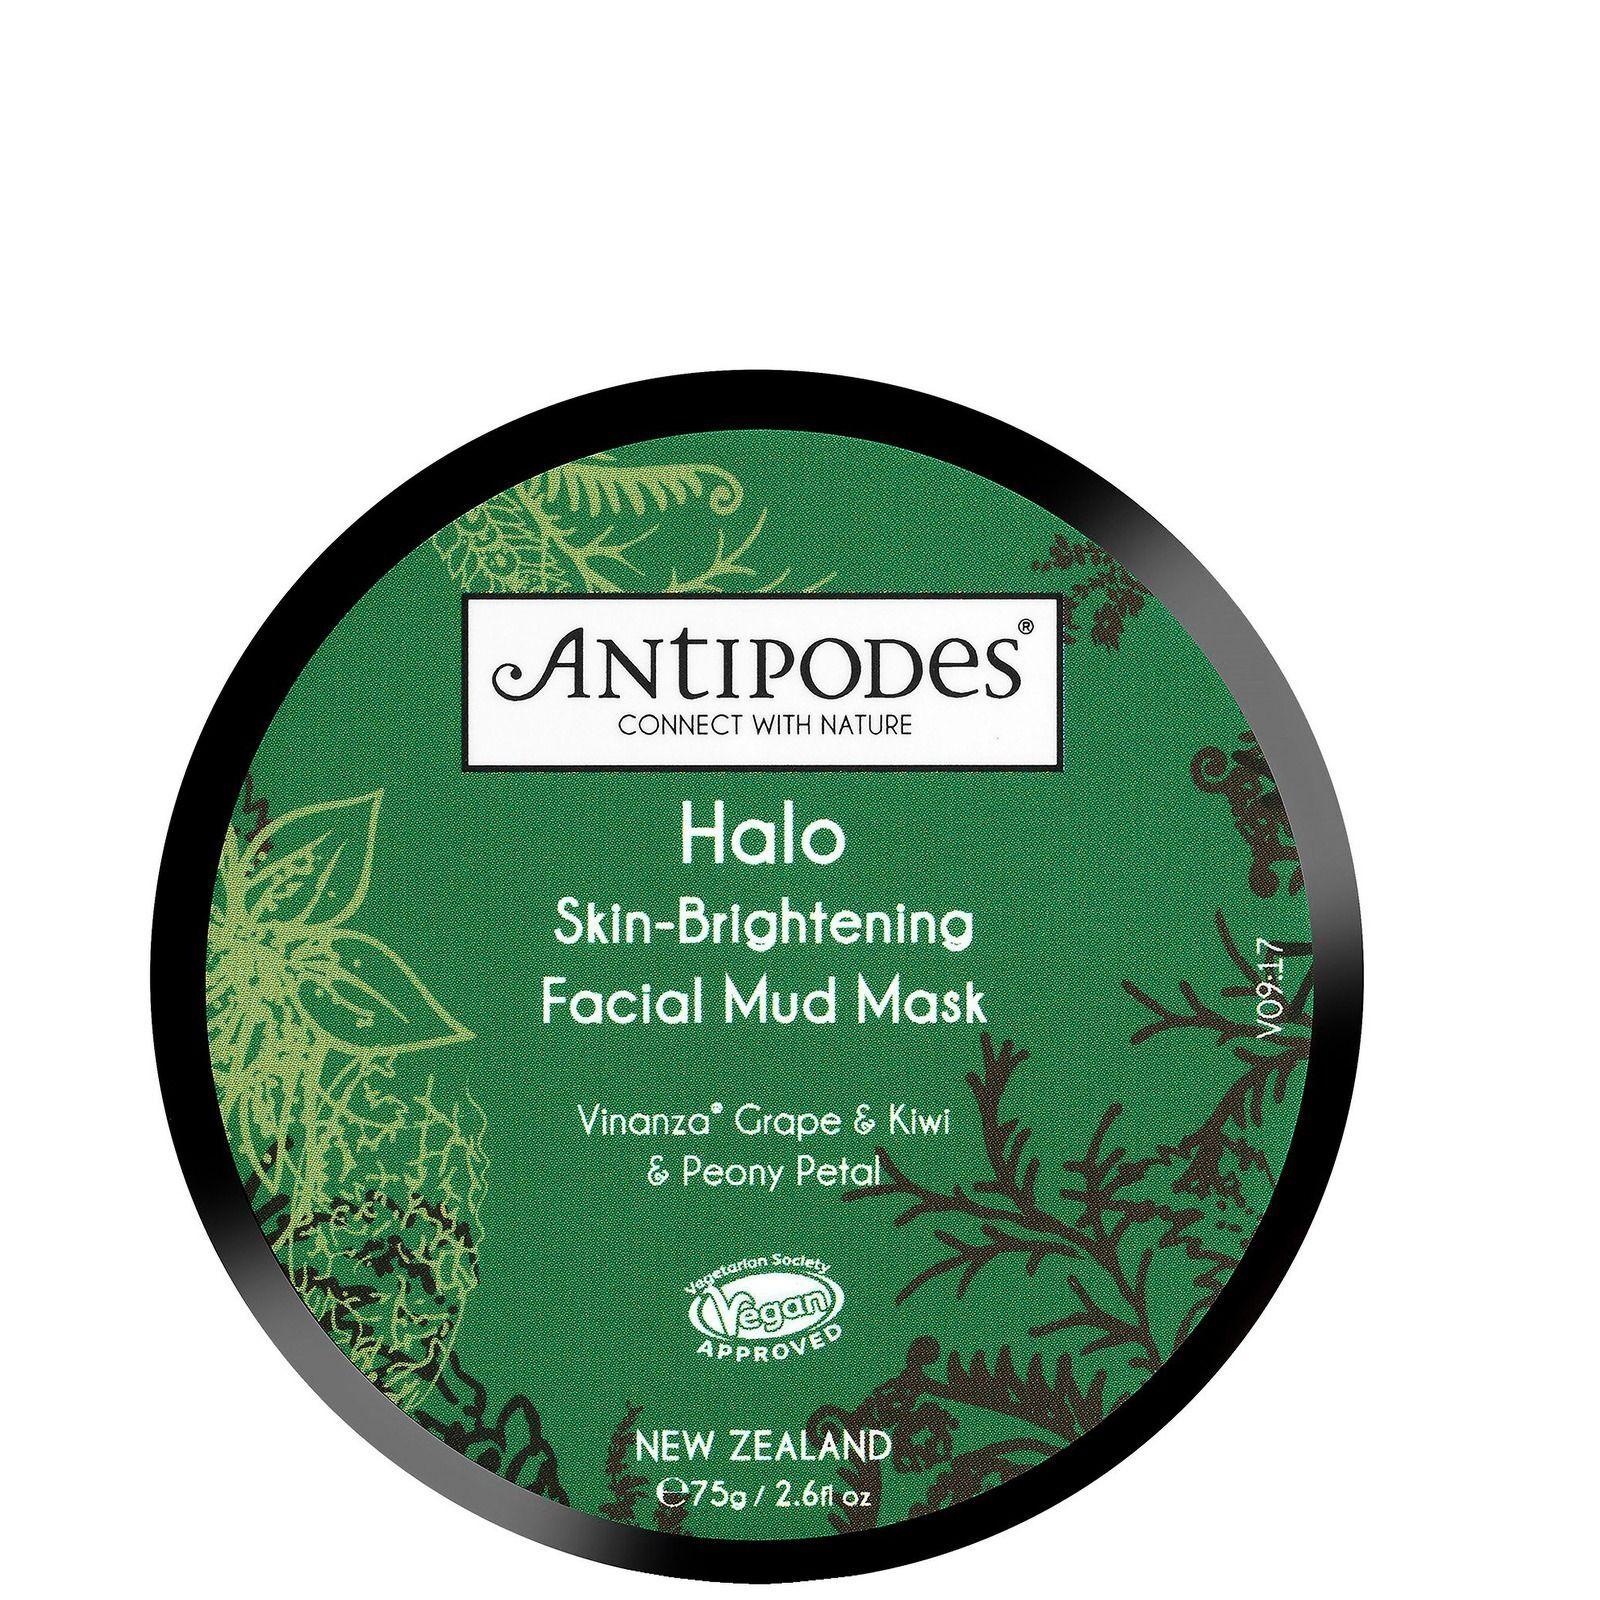 Antipodes Daily Cleanse Maschera di fango facciale halo Skin-Brightening 75g